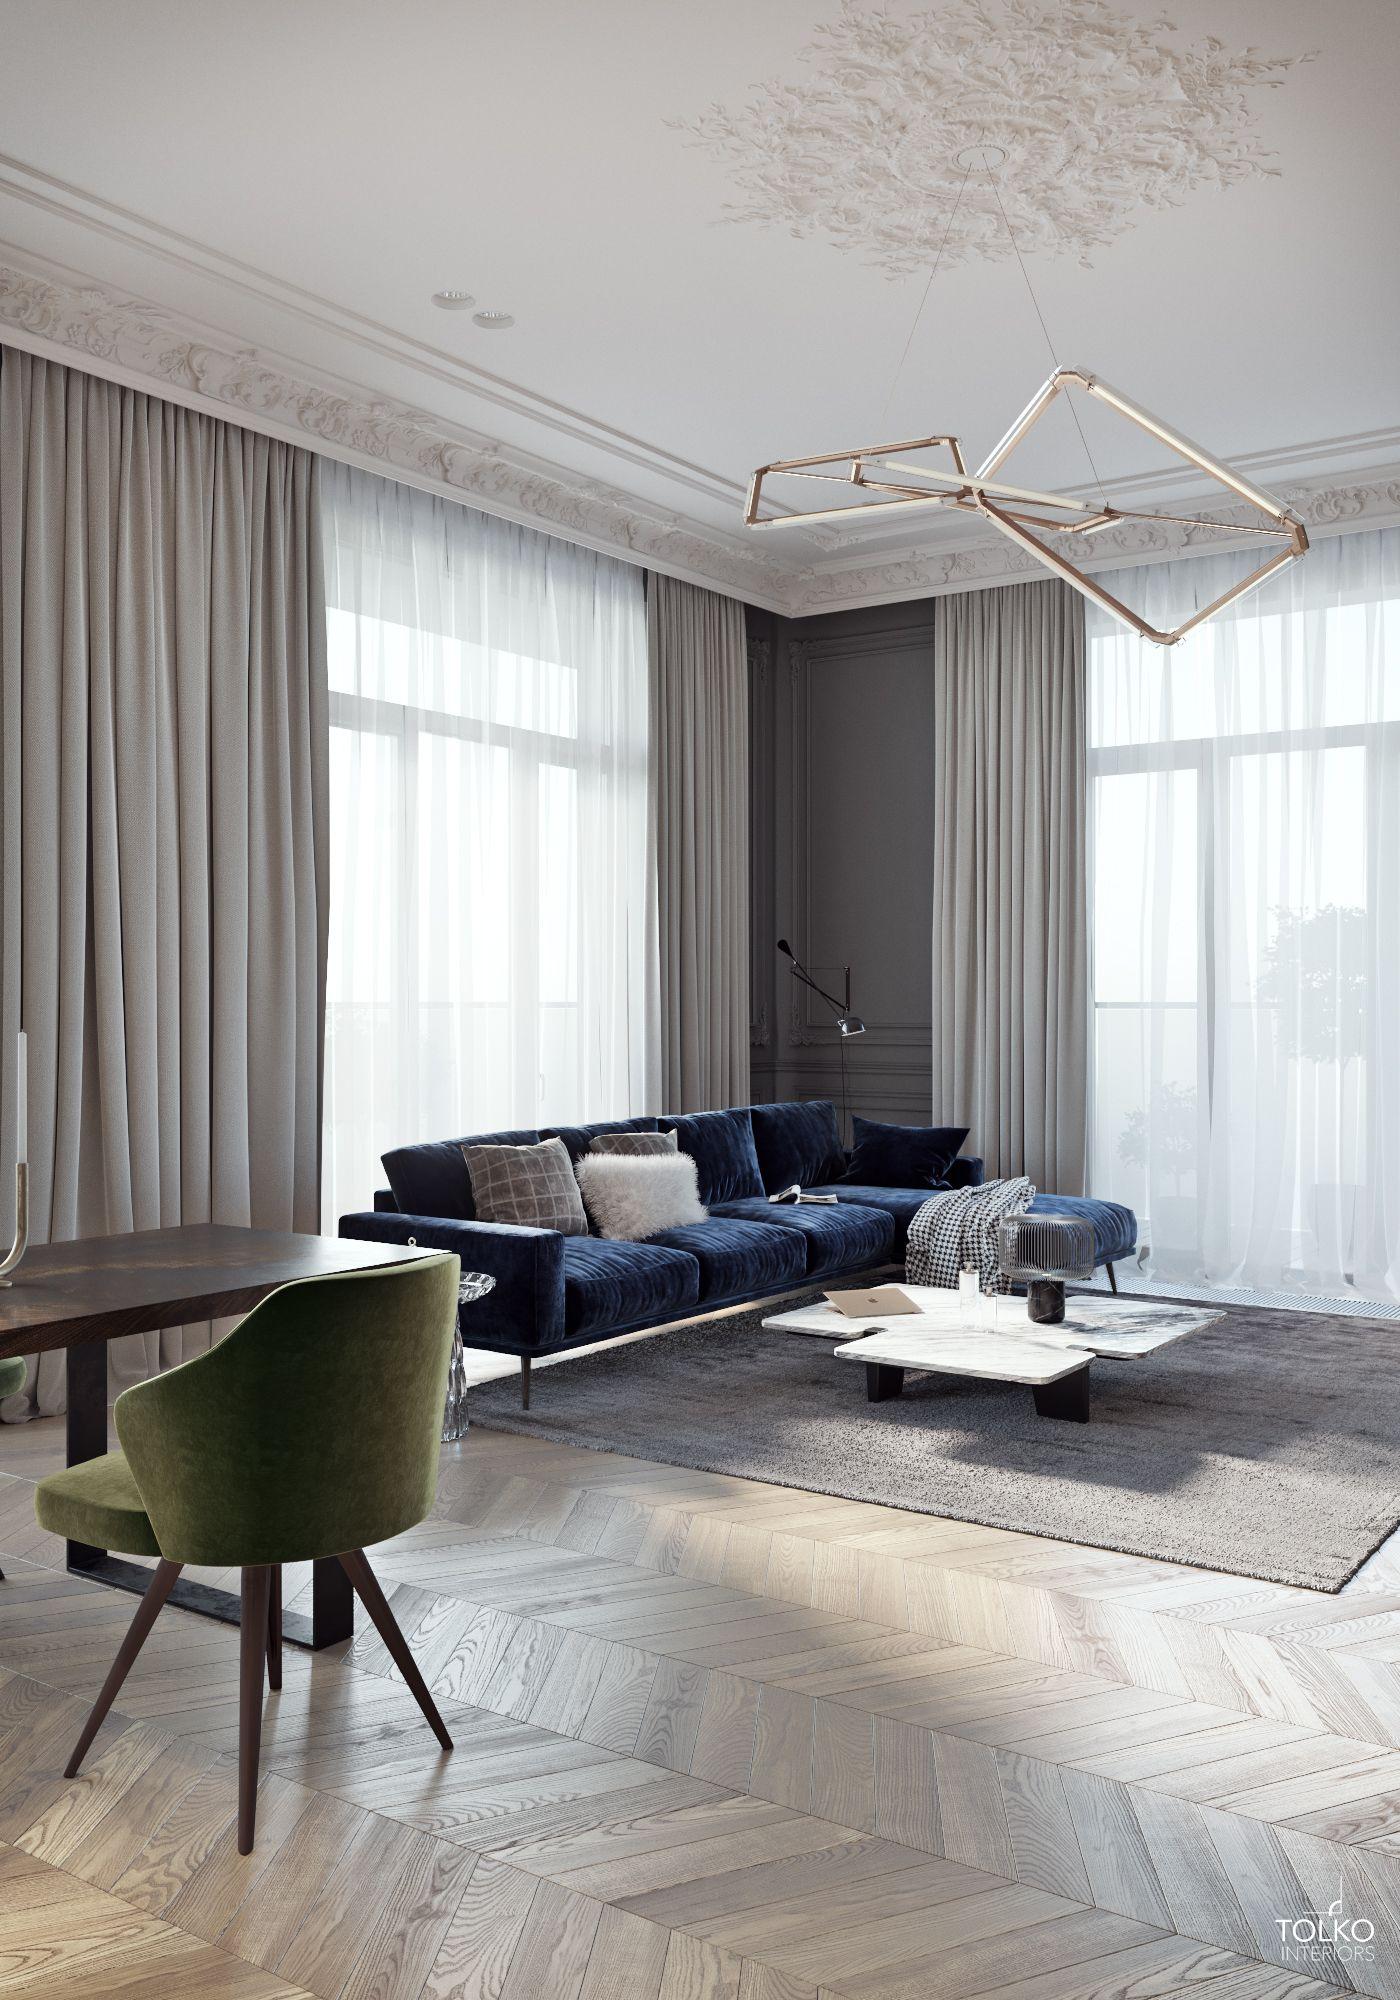 Pin by Cherie Stein Interiors on Interior Design | Pinterest ...